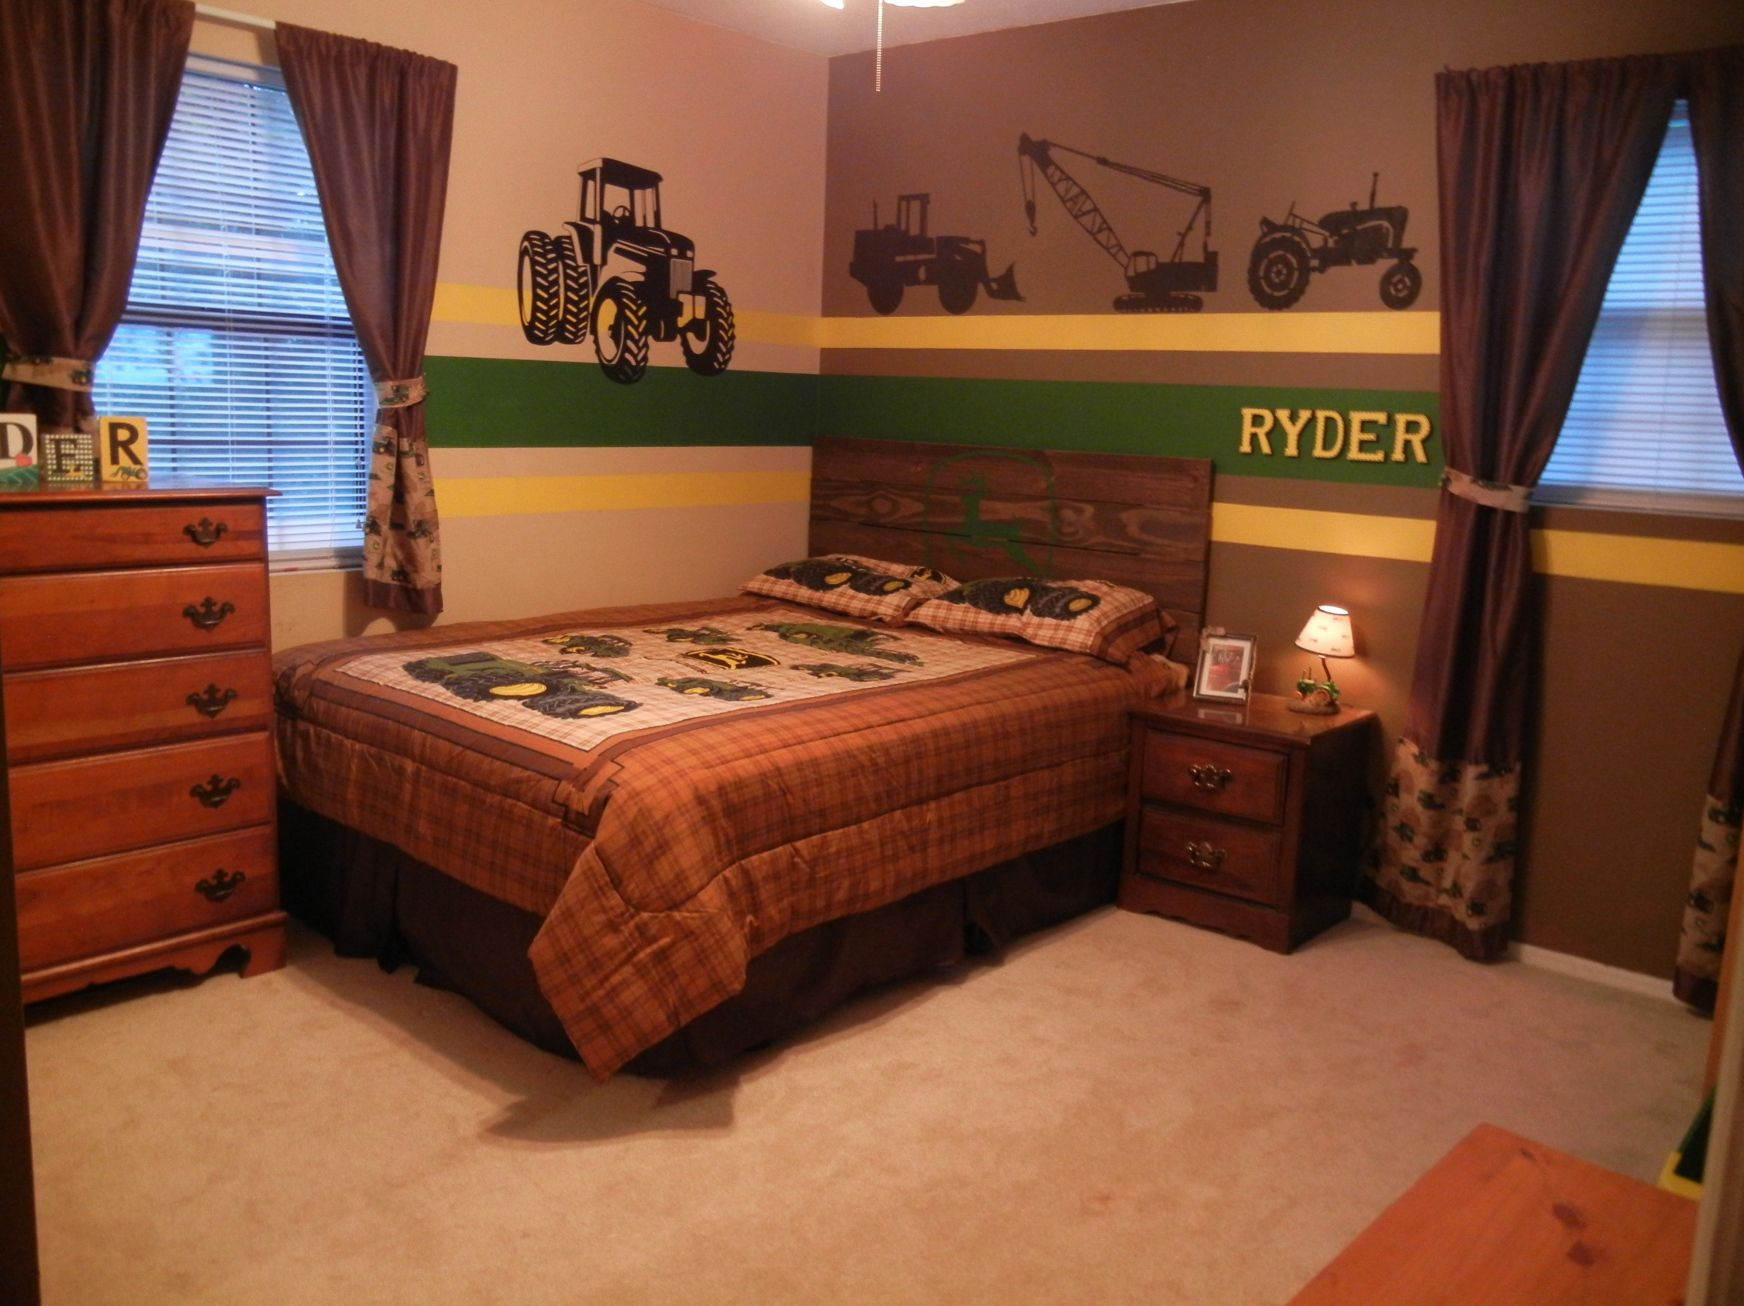 John Deere Kids Room Decor Mens Bedroom Interior Design - John deere idees de decoration de chambre